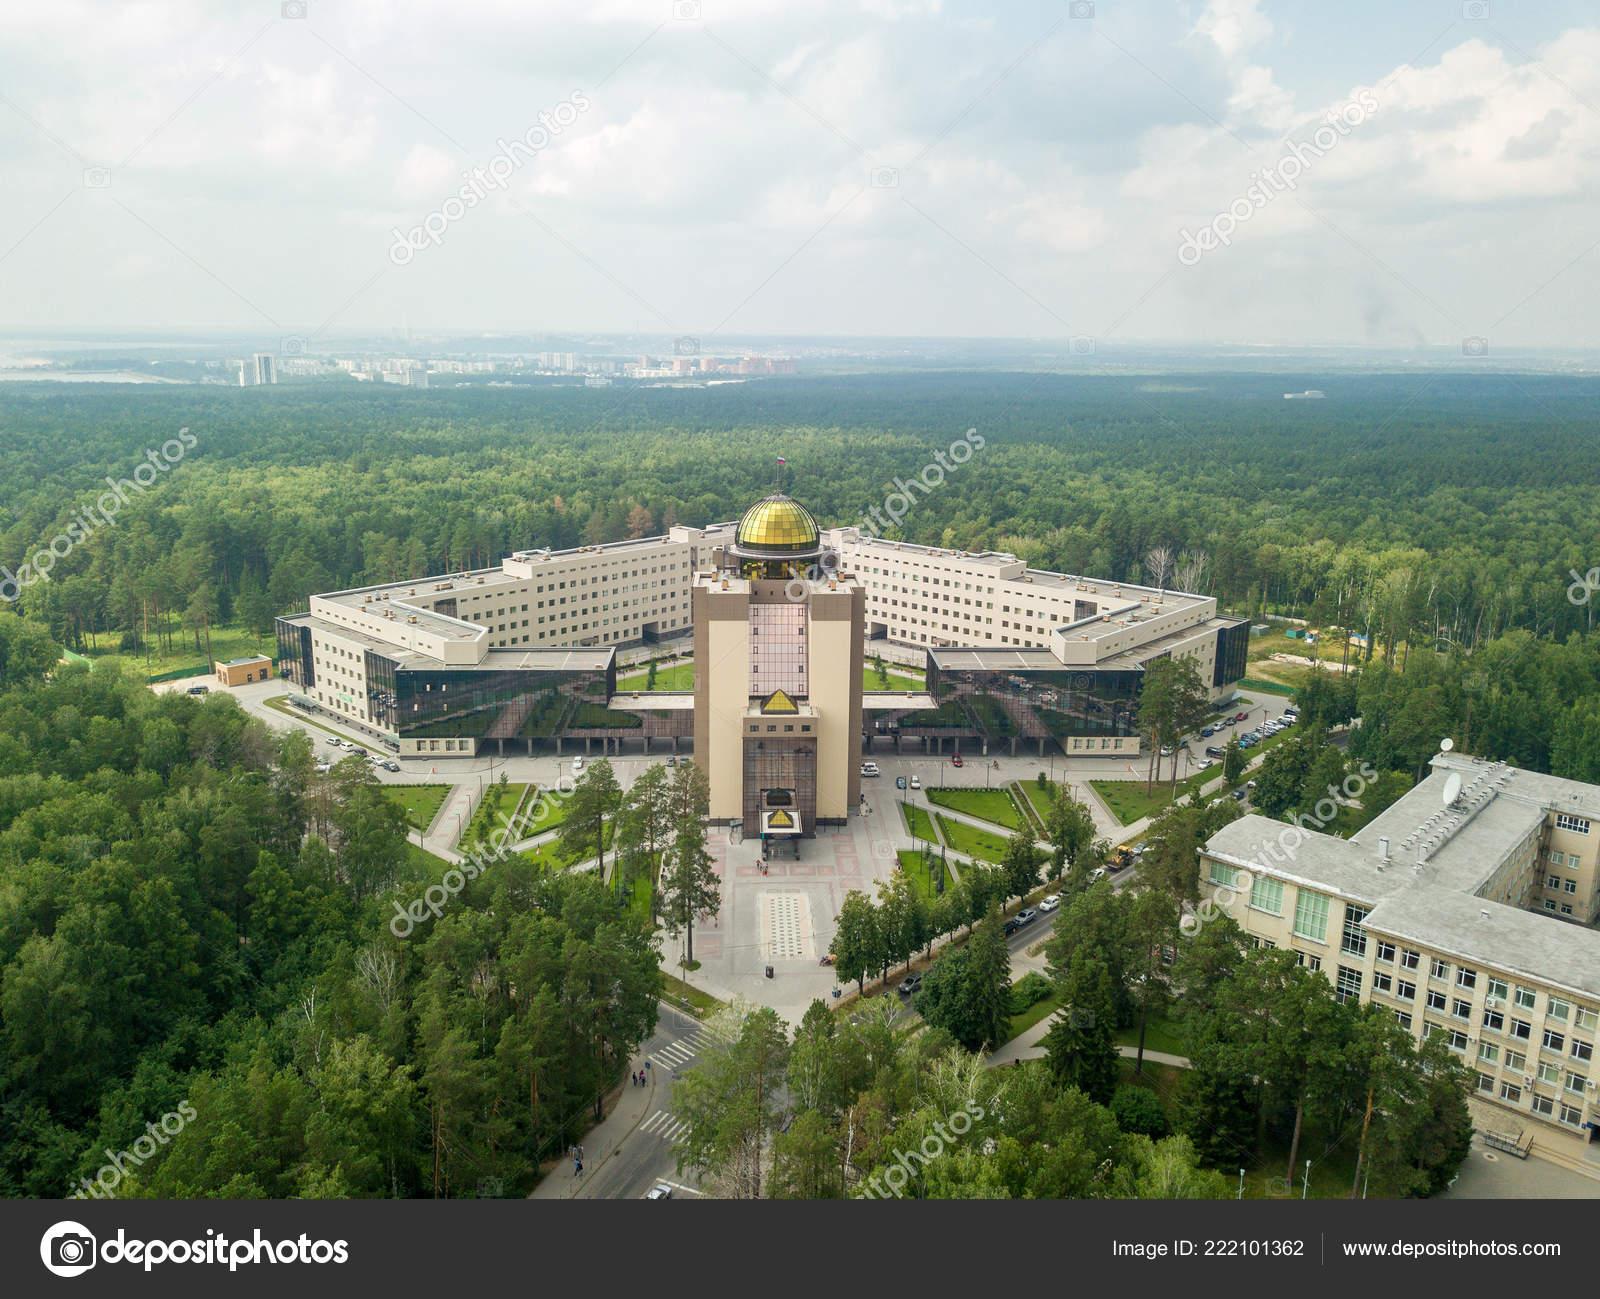 Russia, Novosibirsk - July 20, 2018: Novosibirsk State Universit